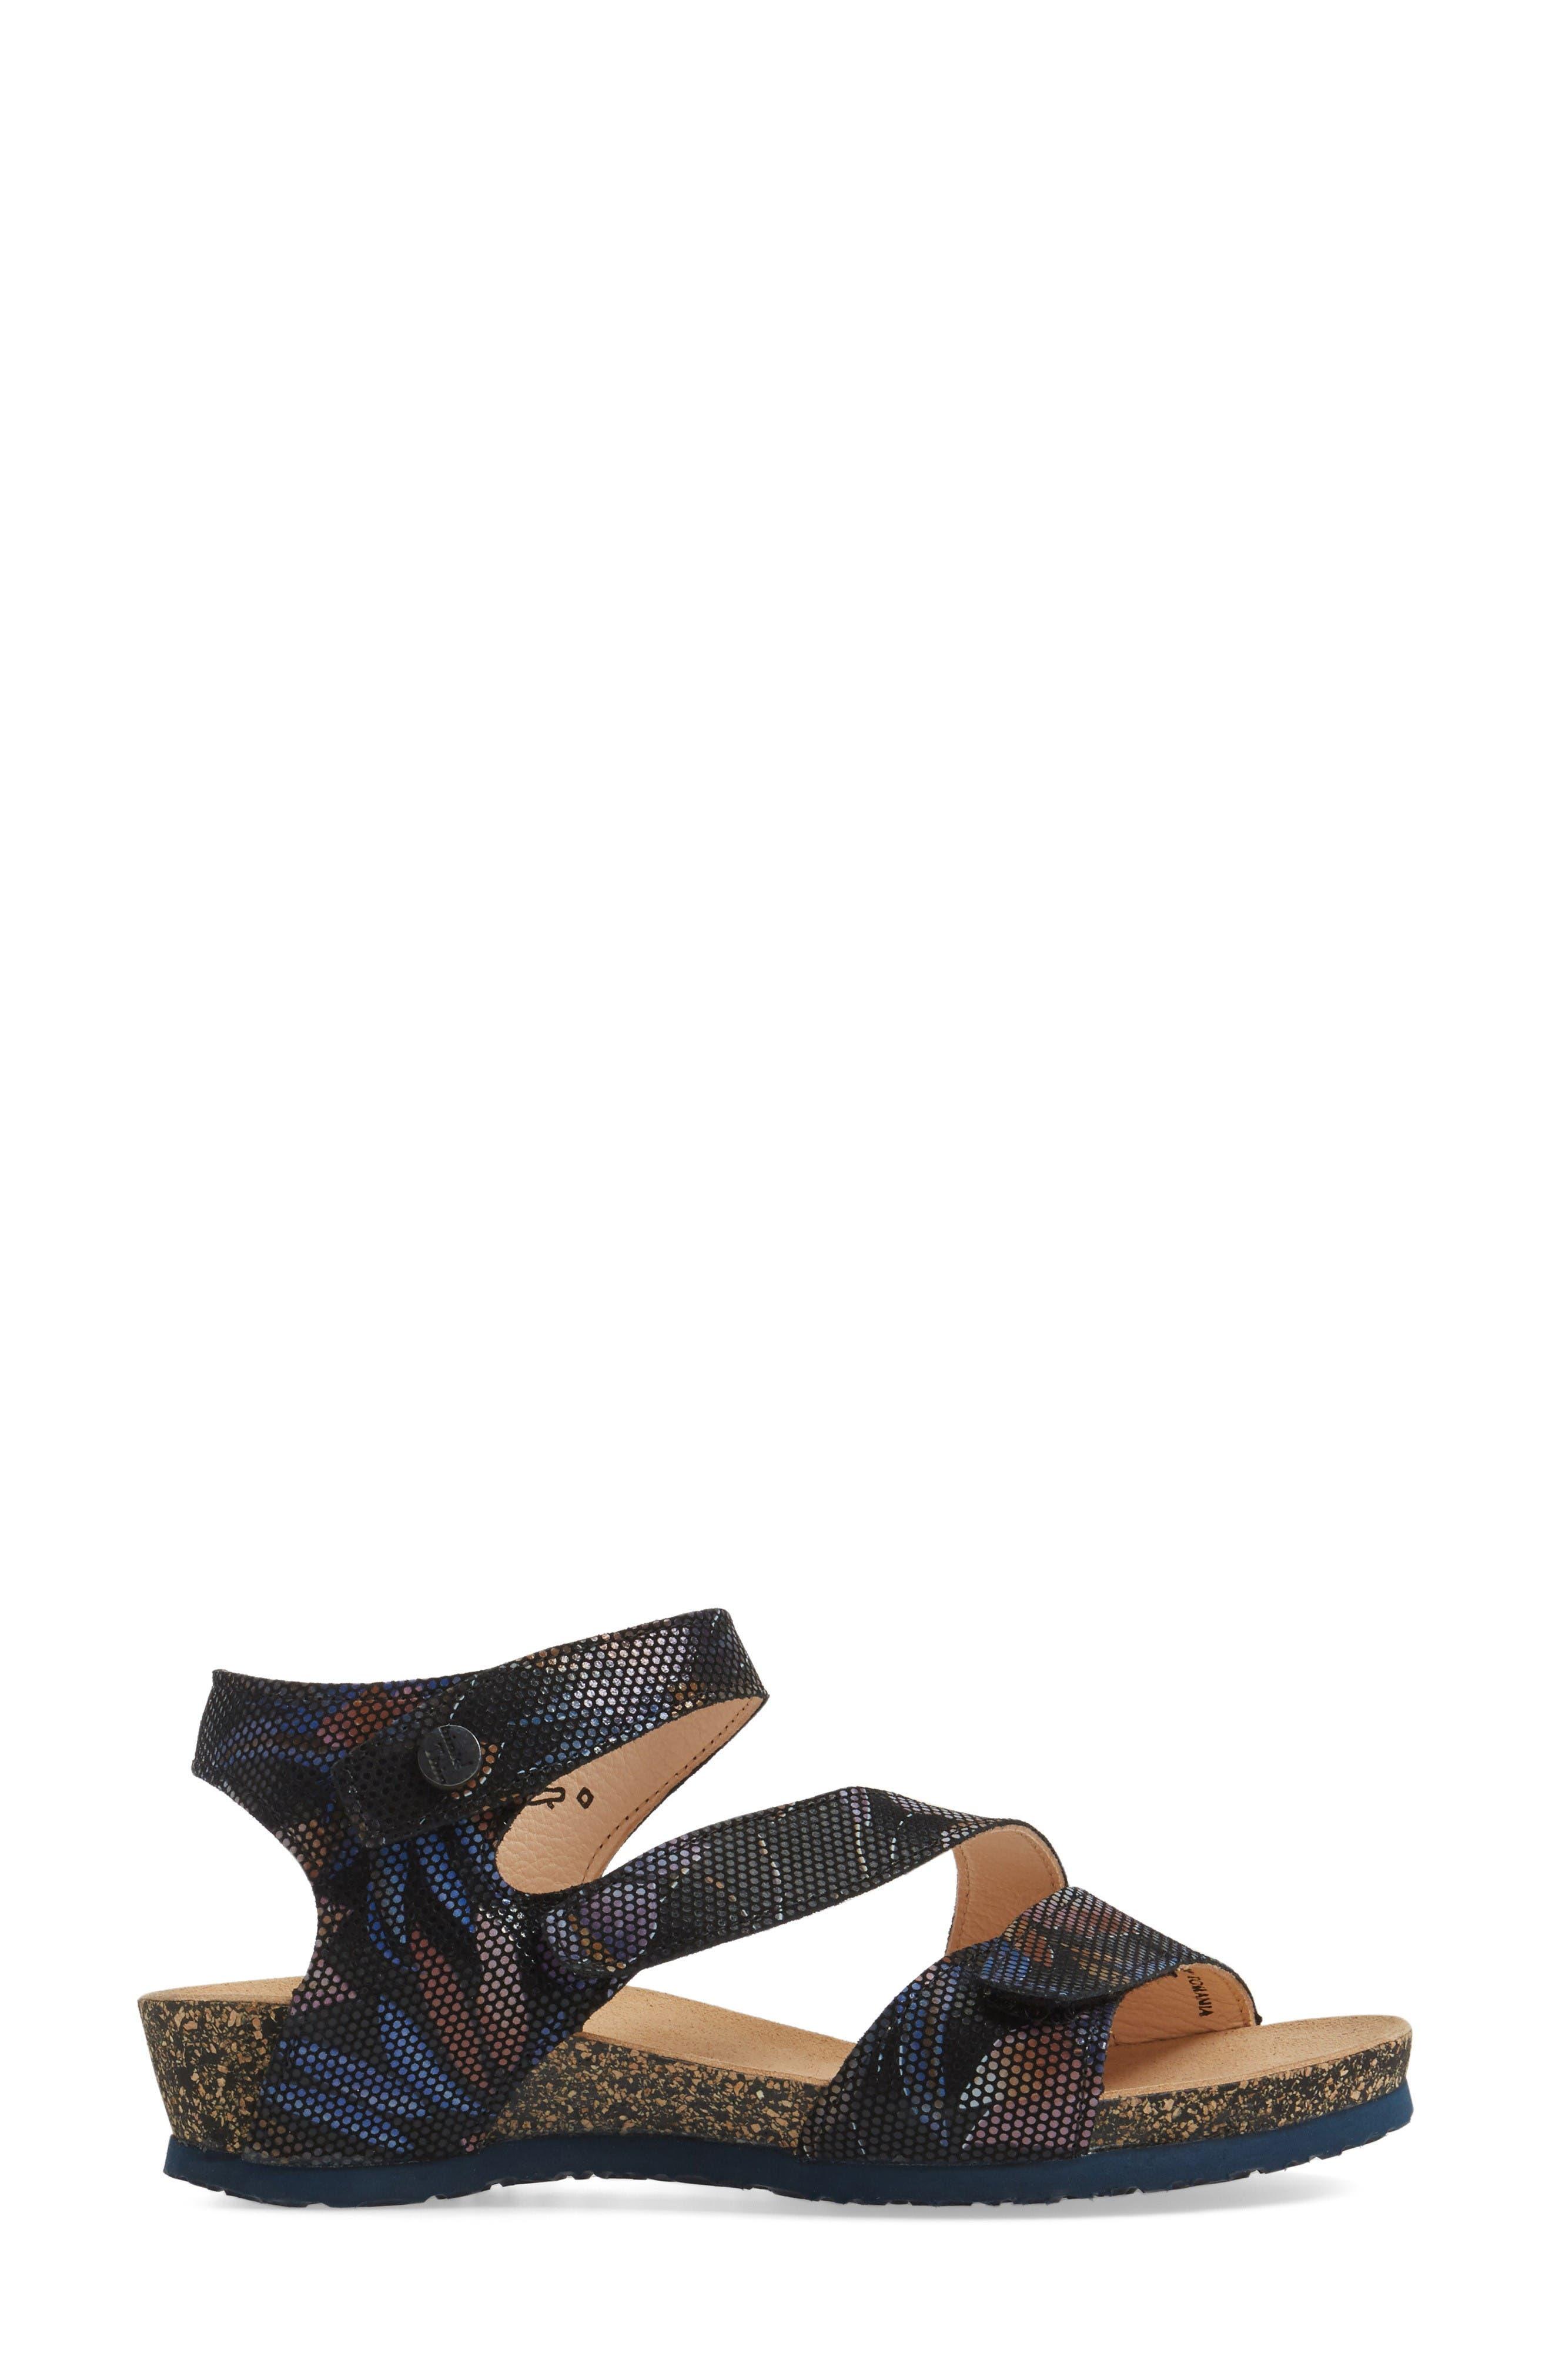 Alternate Image 3  - Think! 'Dumia' Three Strap Sandal (Online Only)